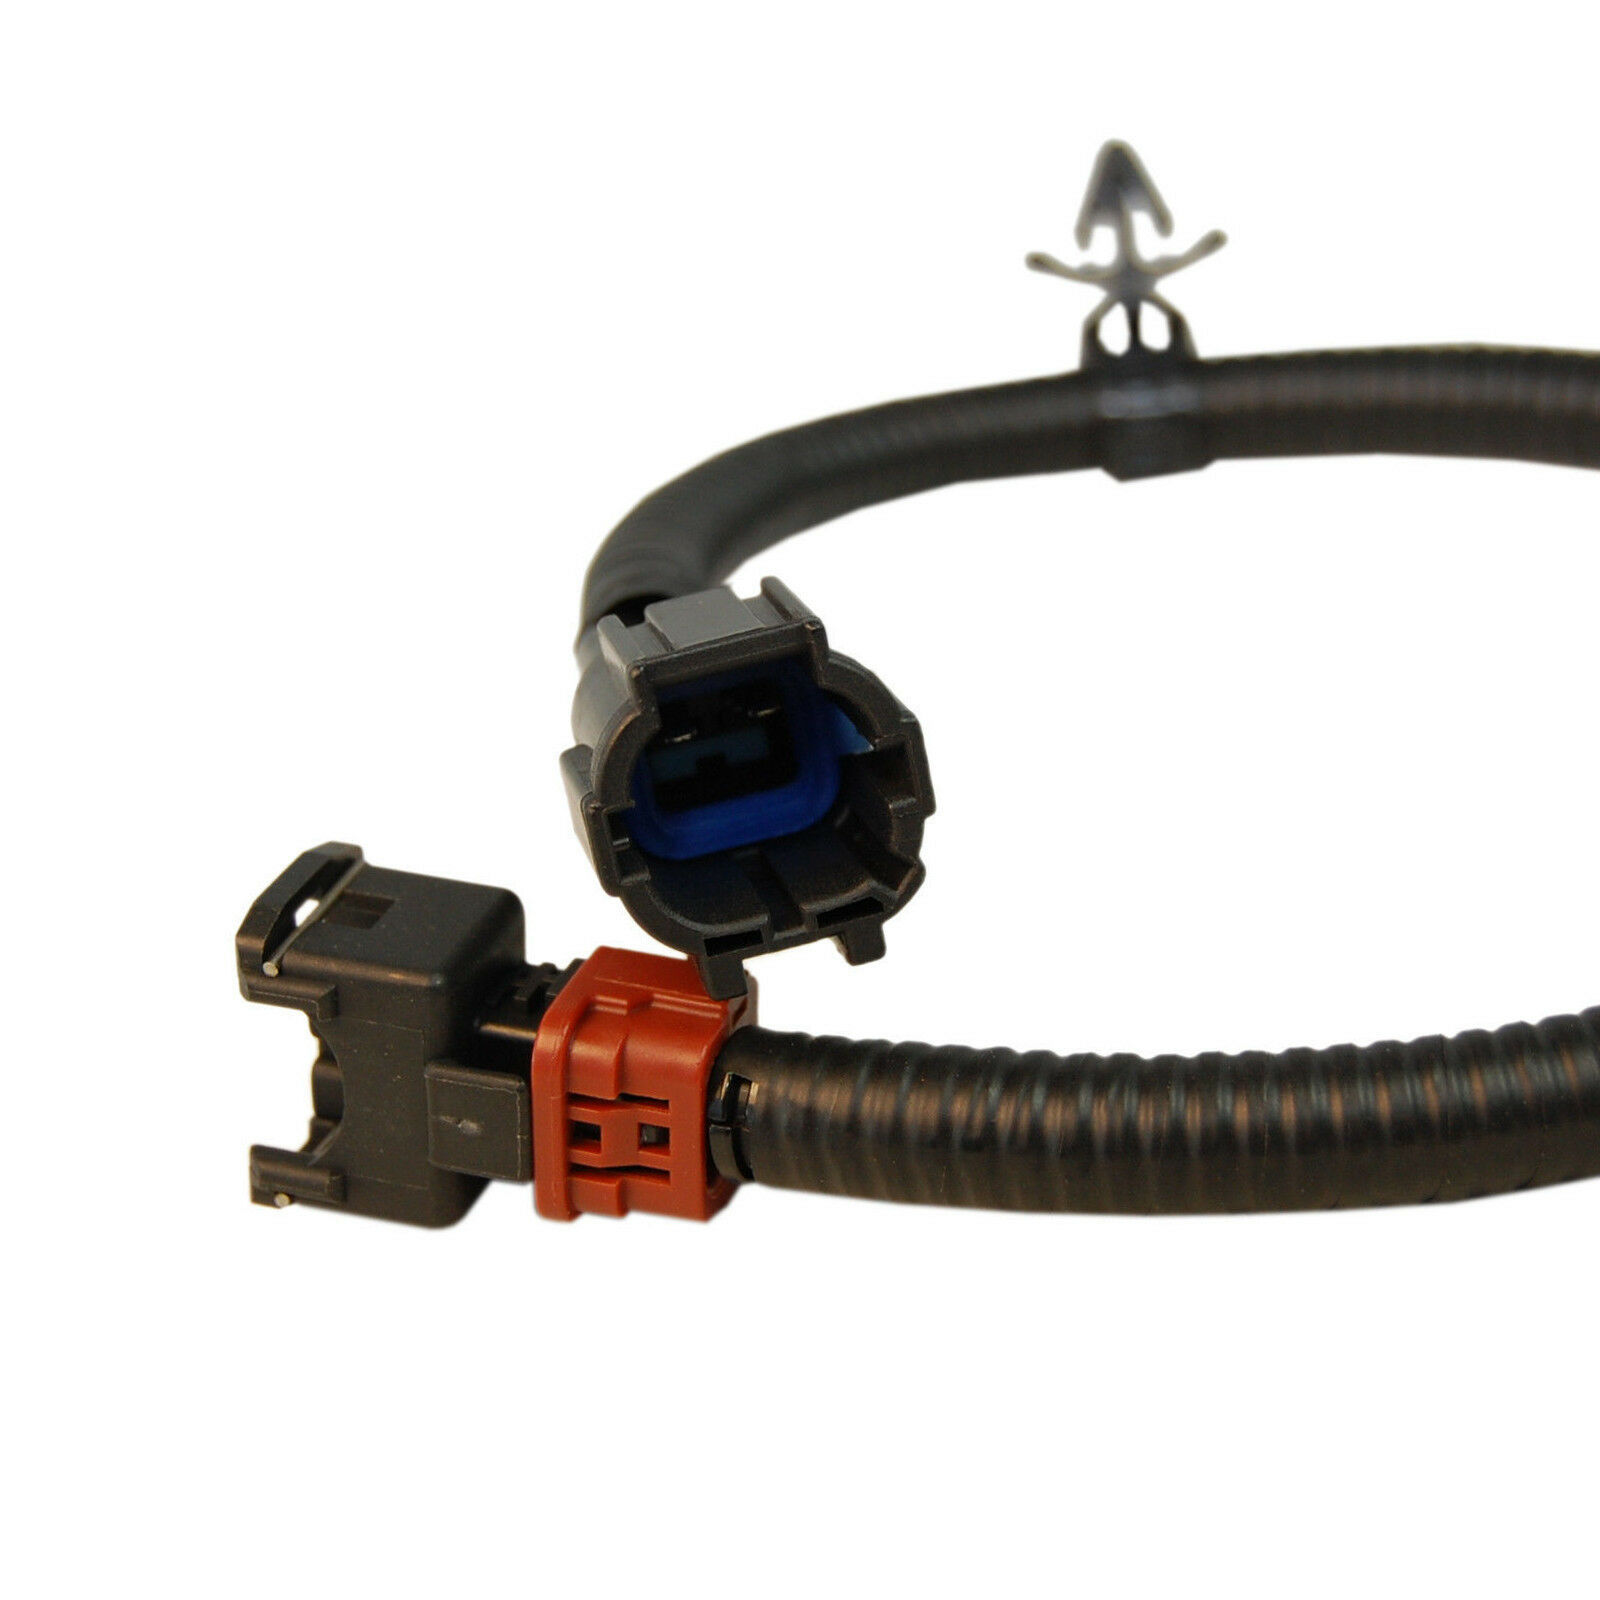 Hqrp Wiring Harness Knock Sensor Fits Nissan Infiniti 24079 31u01 1996 I30 3 Of See More